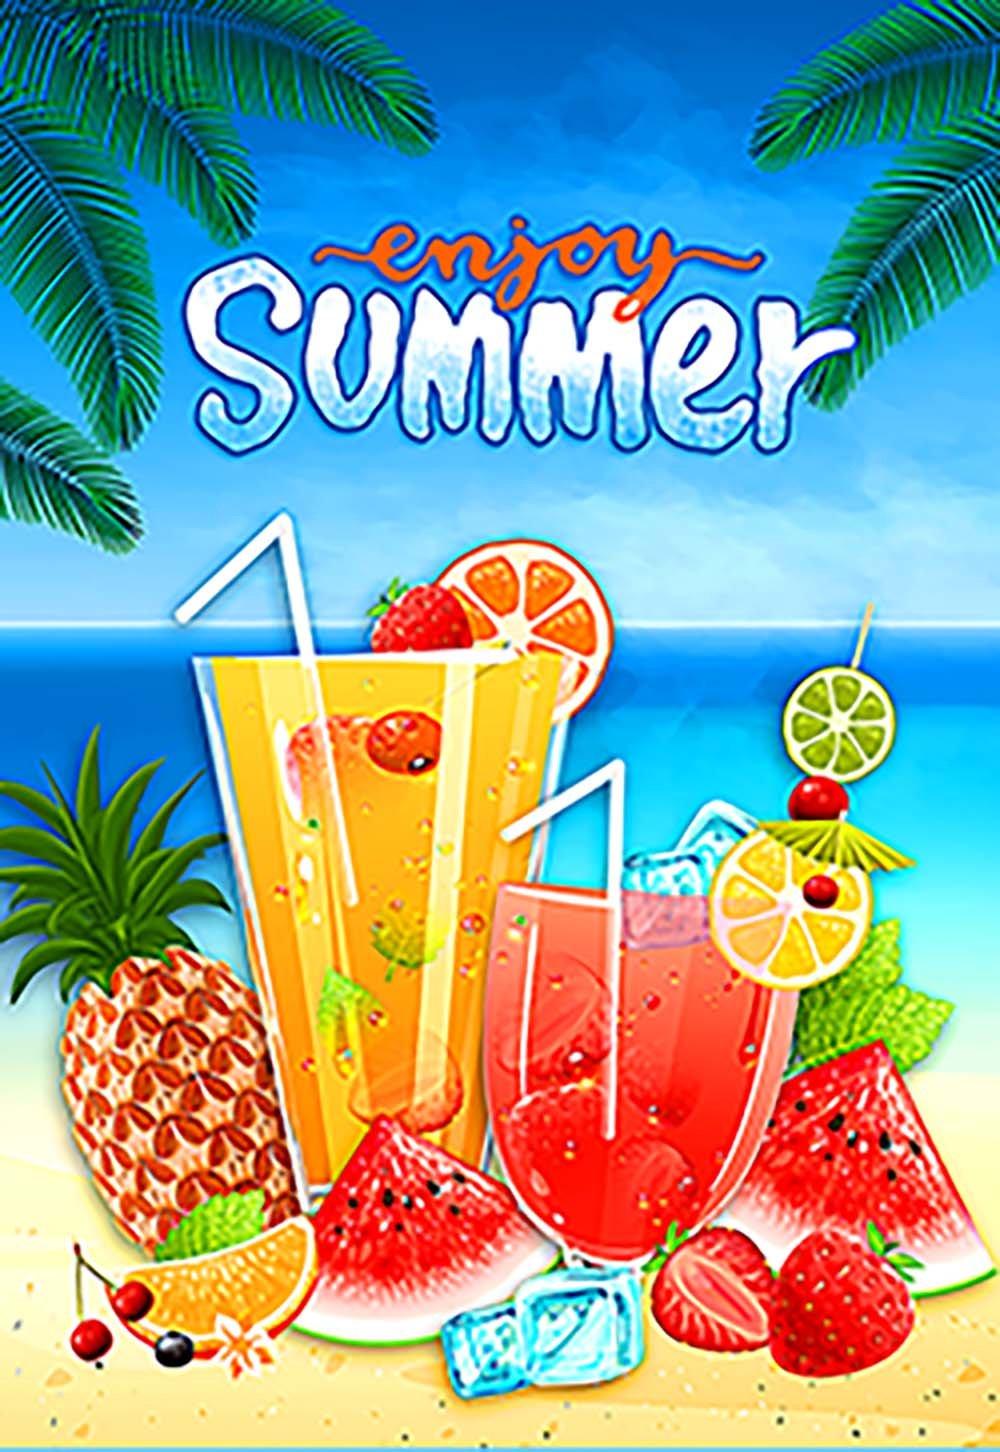 Morigins Summer Fun 28x40 Inch Decorative Tropical Beach Pineapple Party House Flag